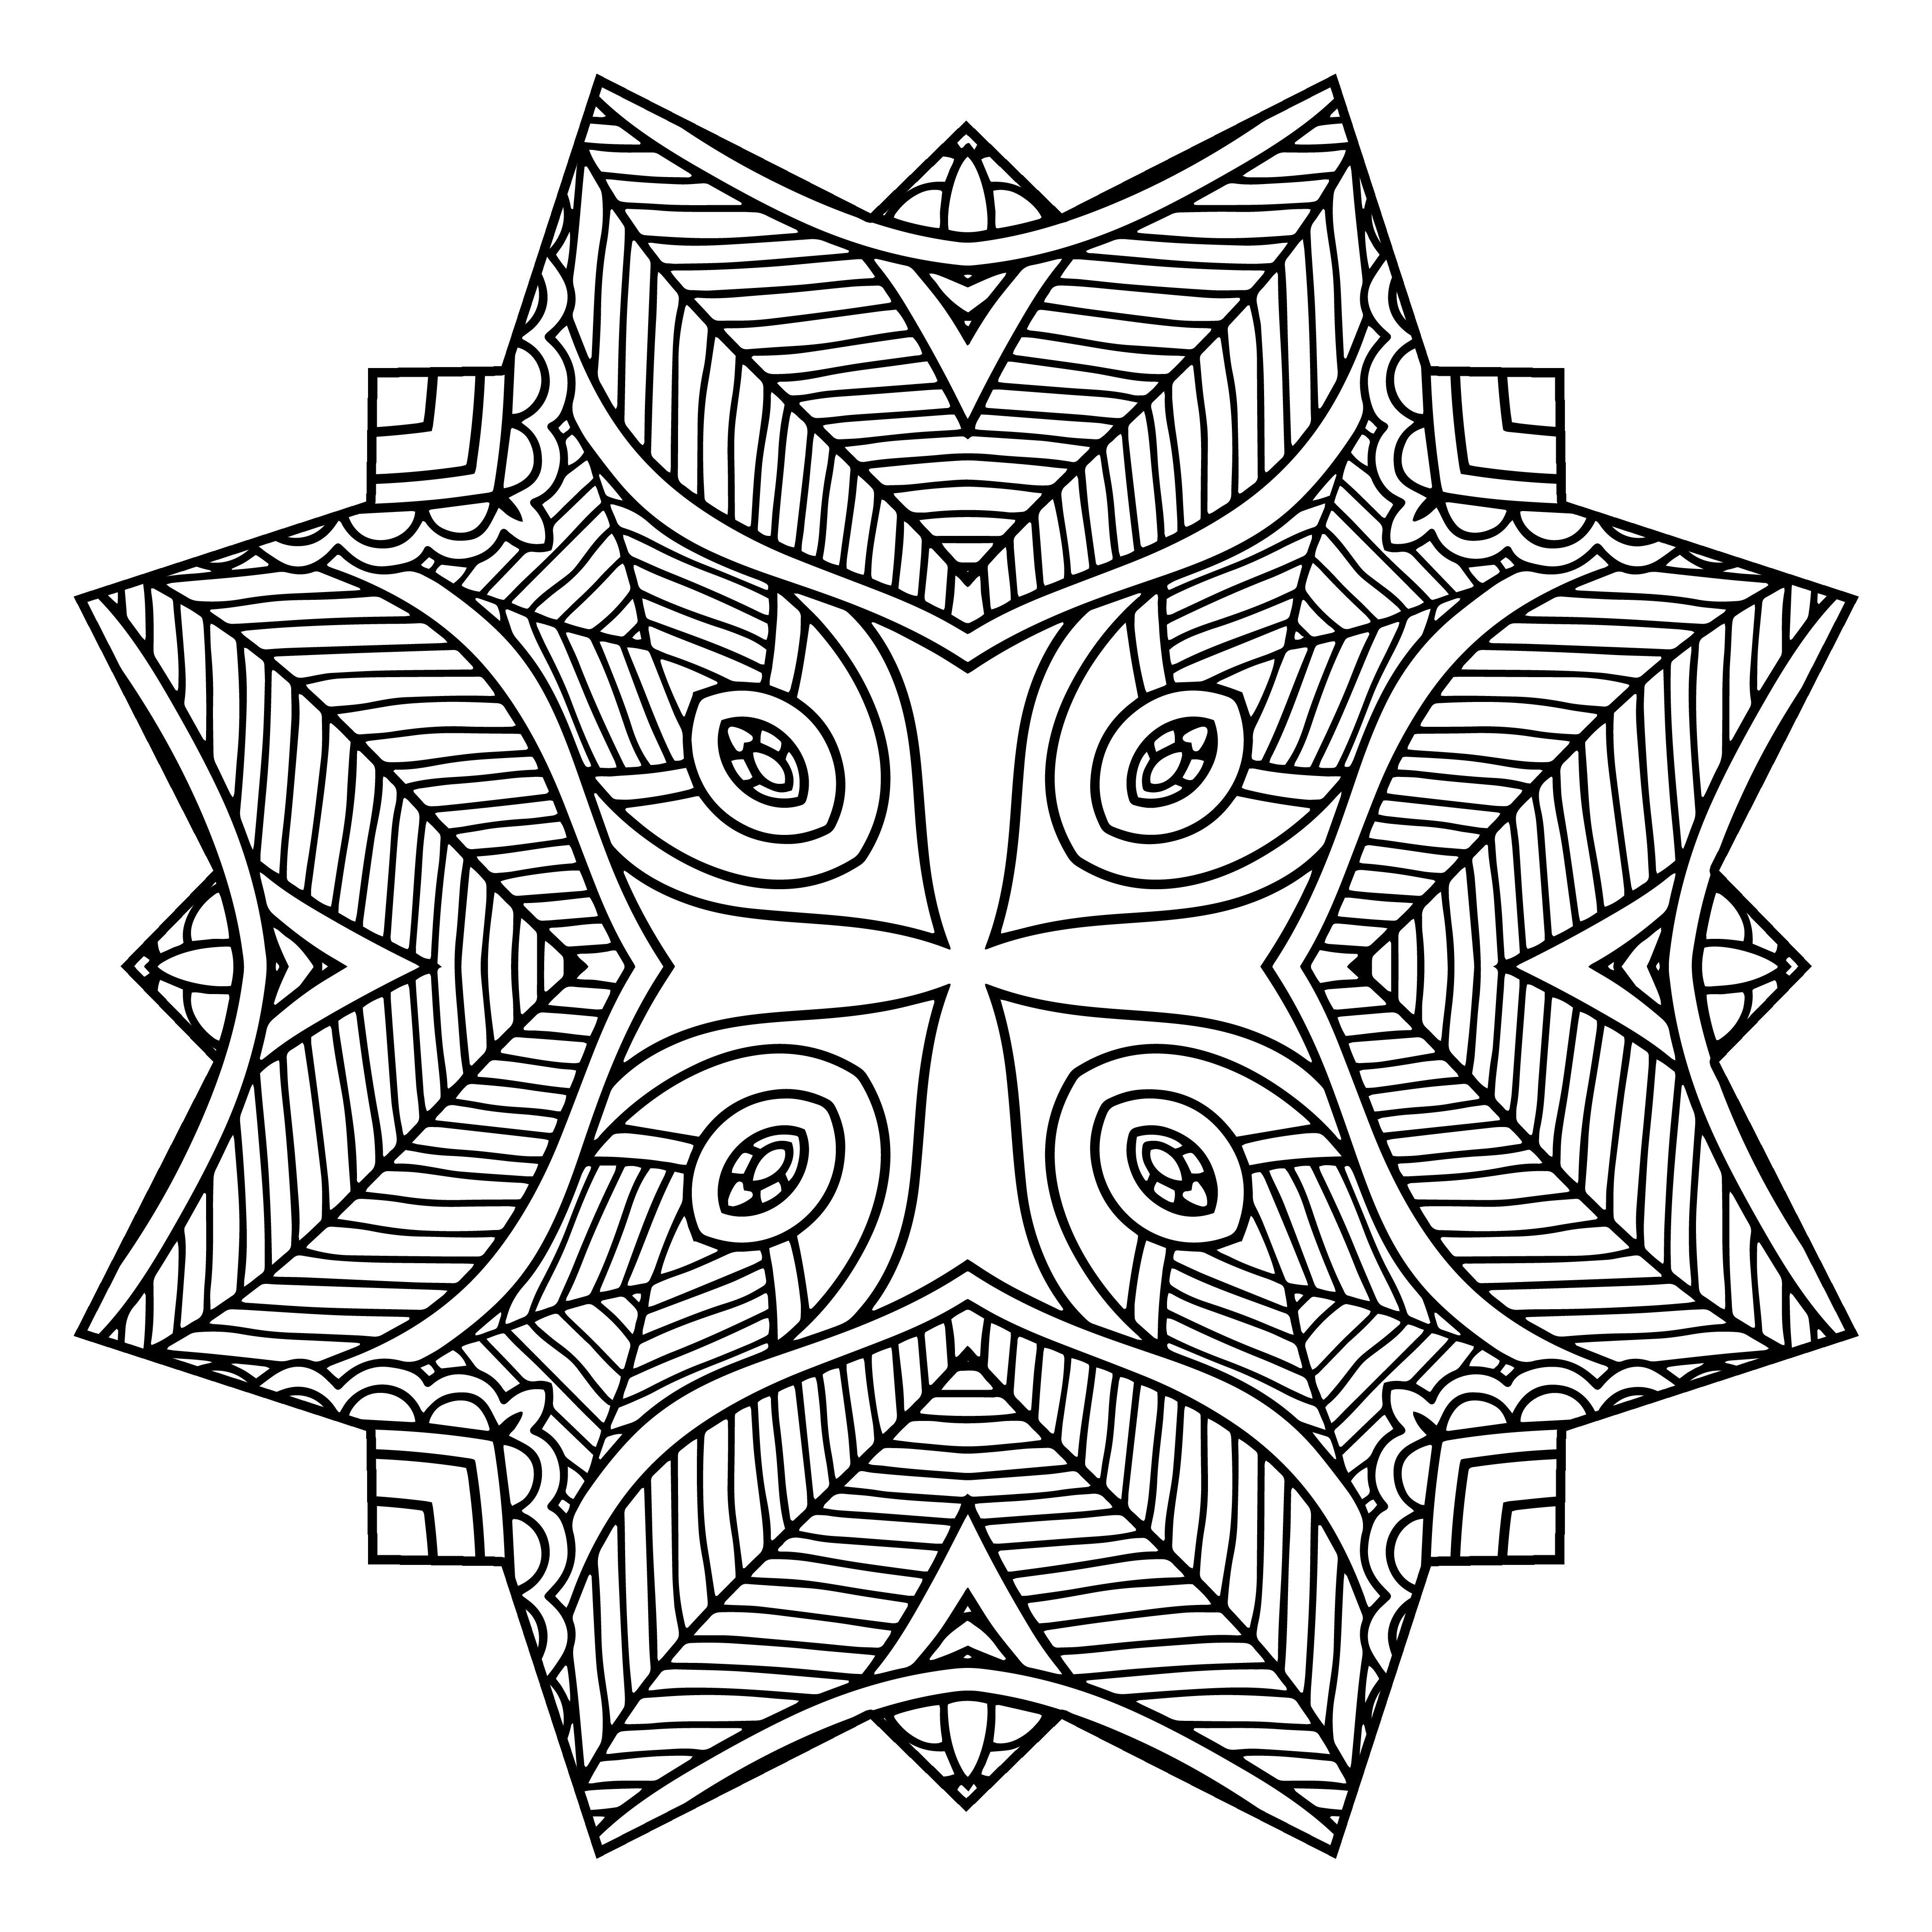 Spun Square Design